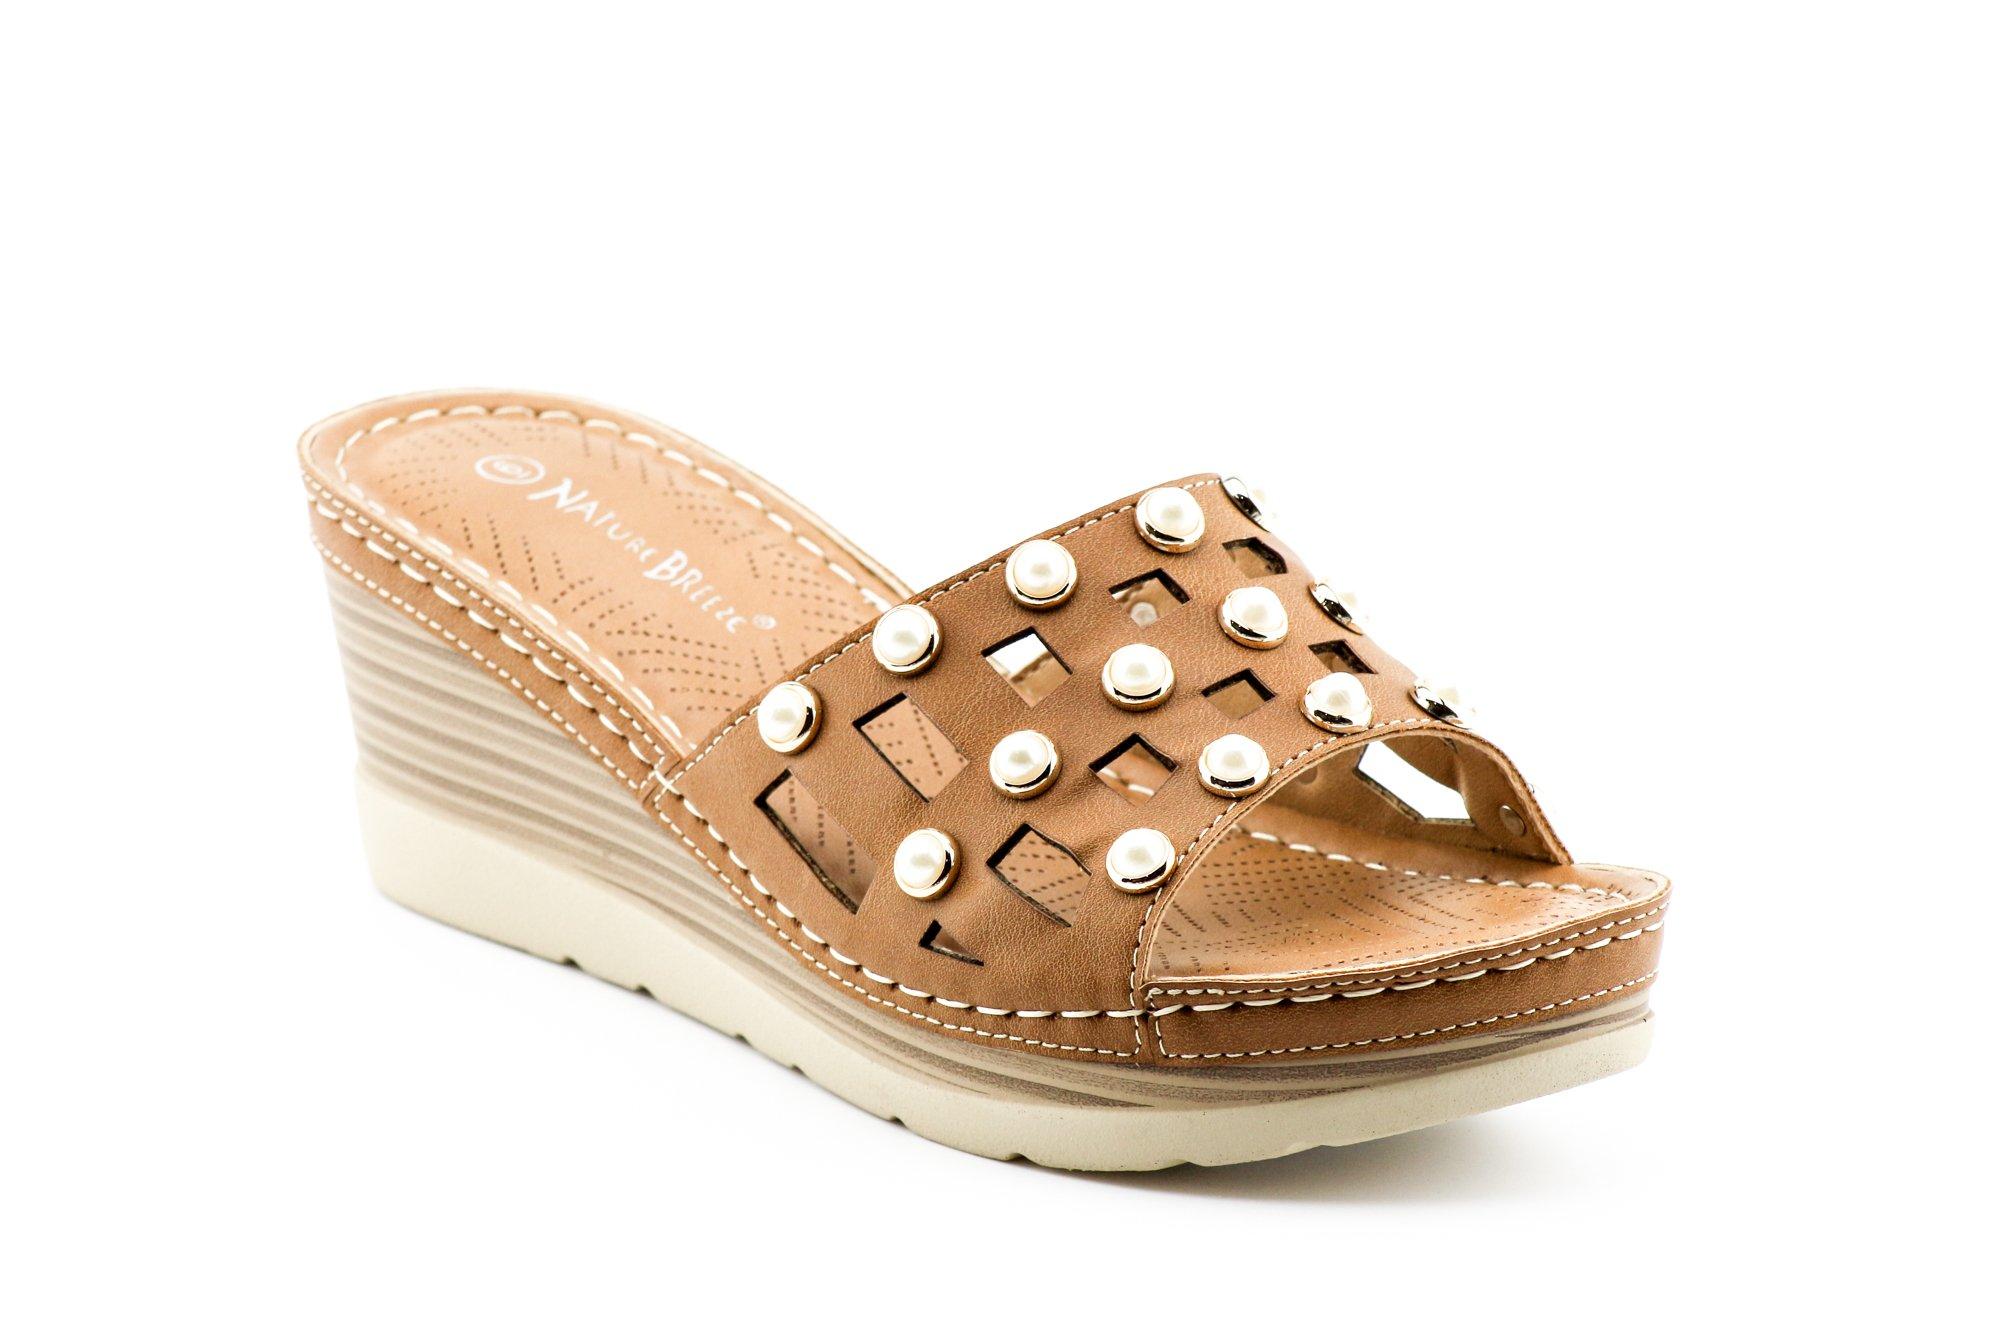 CALICO KIKI XIA-CK03 Women's Comfort Open Toe Slip On Wedge Sandal Platform Shoes (9 US Camel)